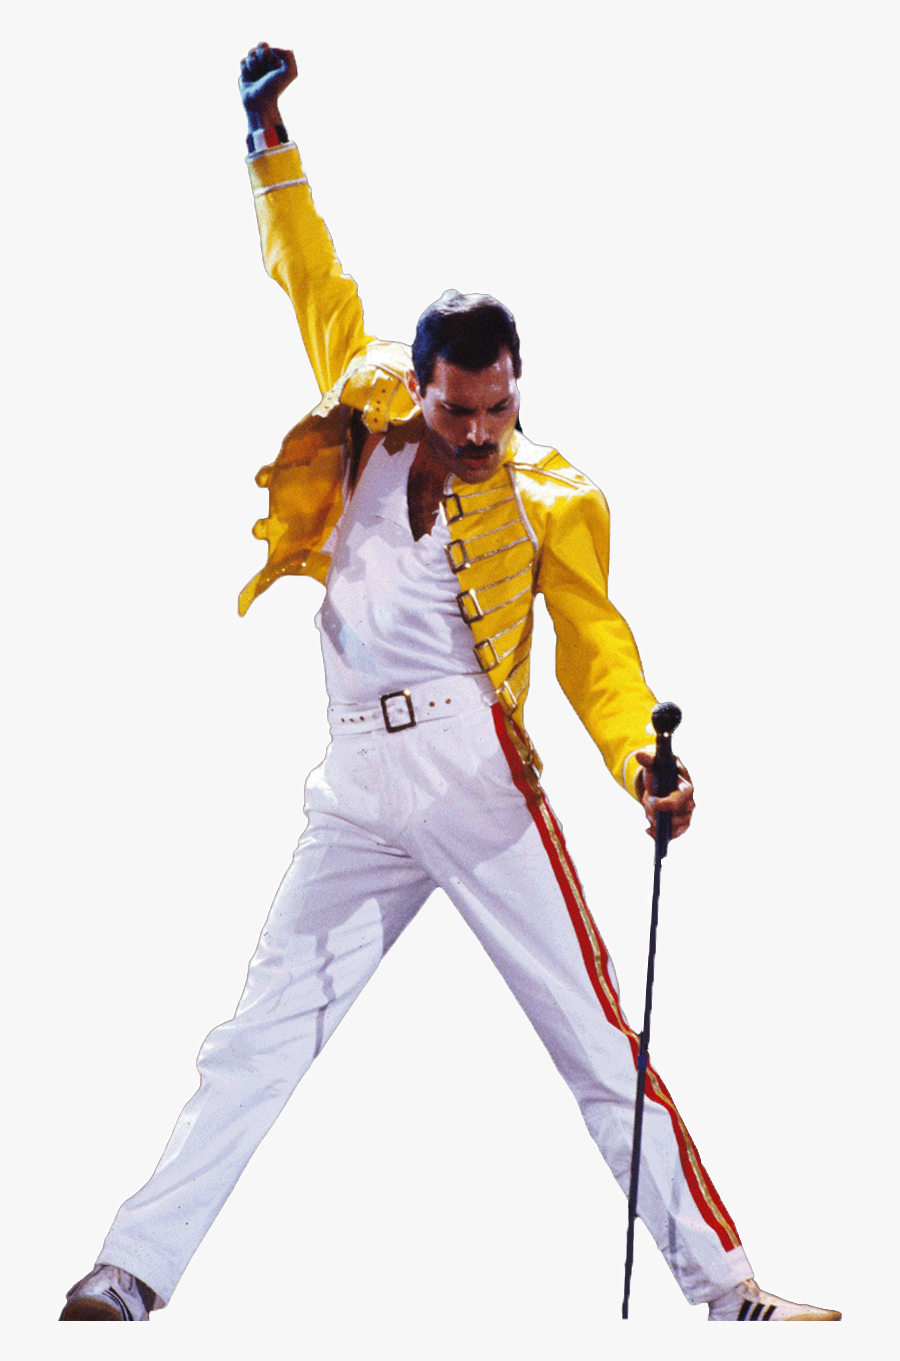 Freddie Mercury Png - Freddie Mercury Yellow Jacket Pose, Transparent Clipart